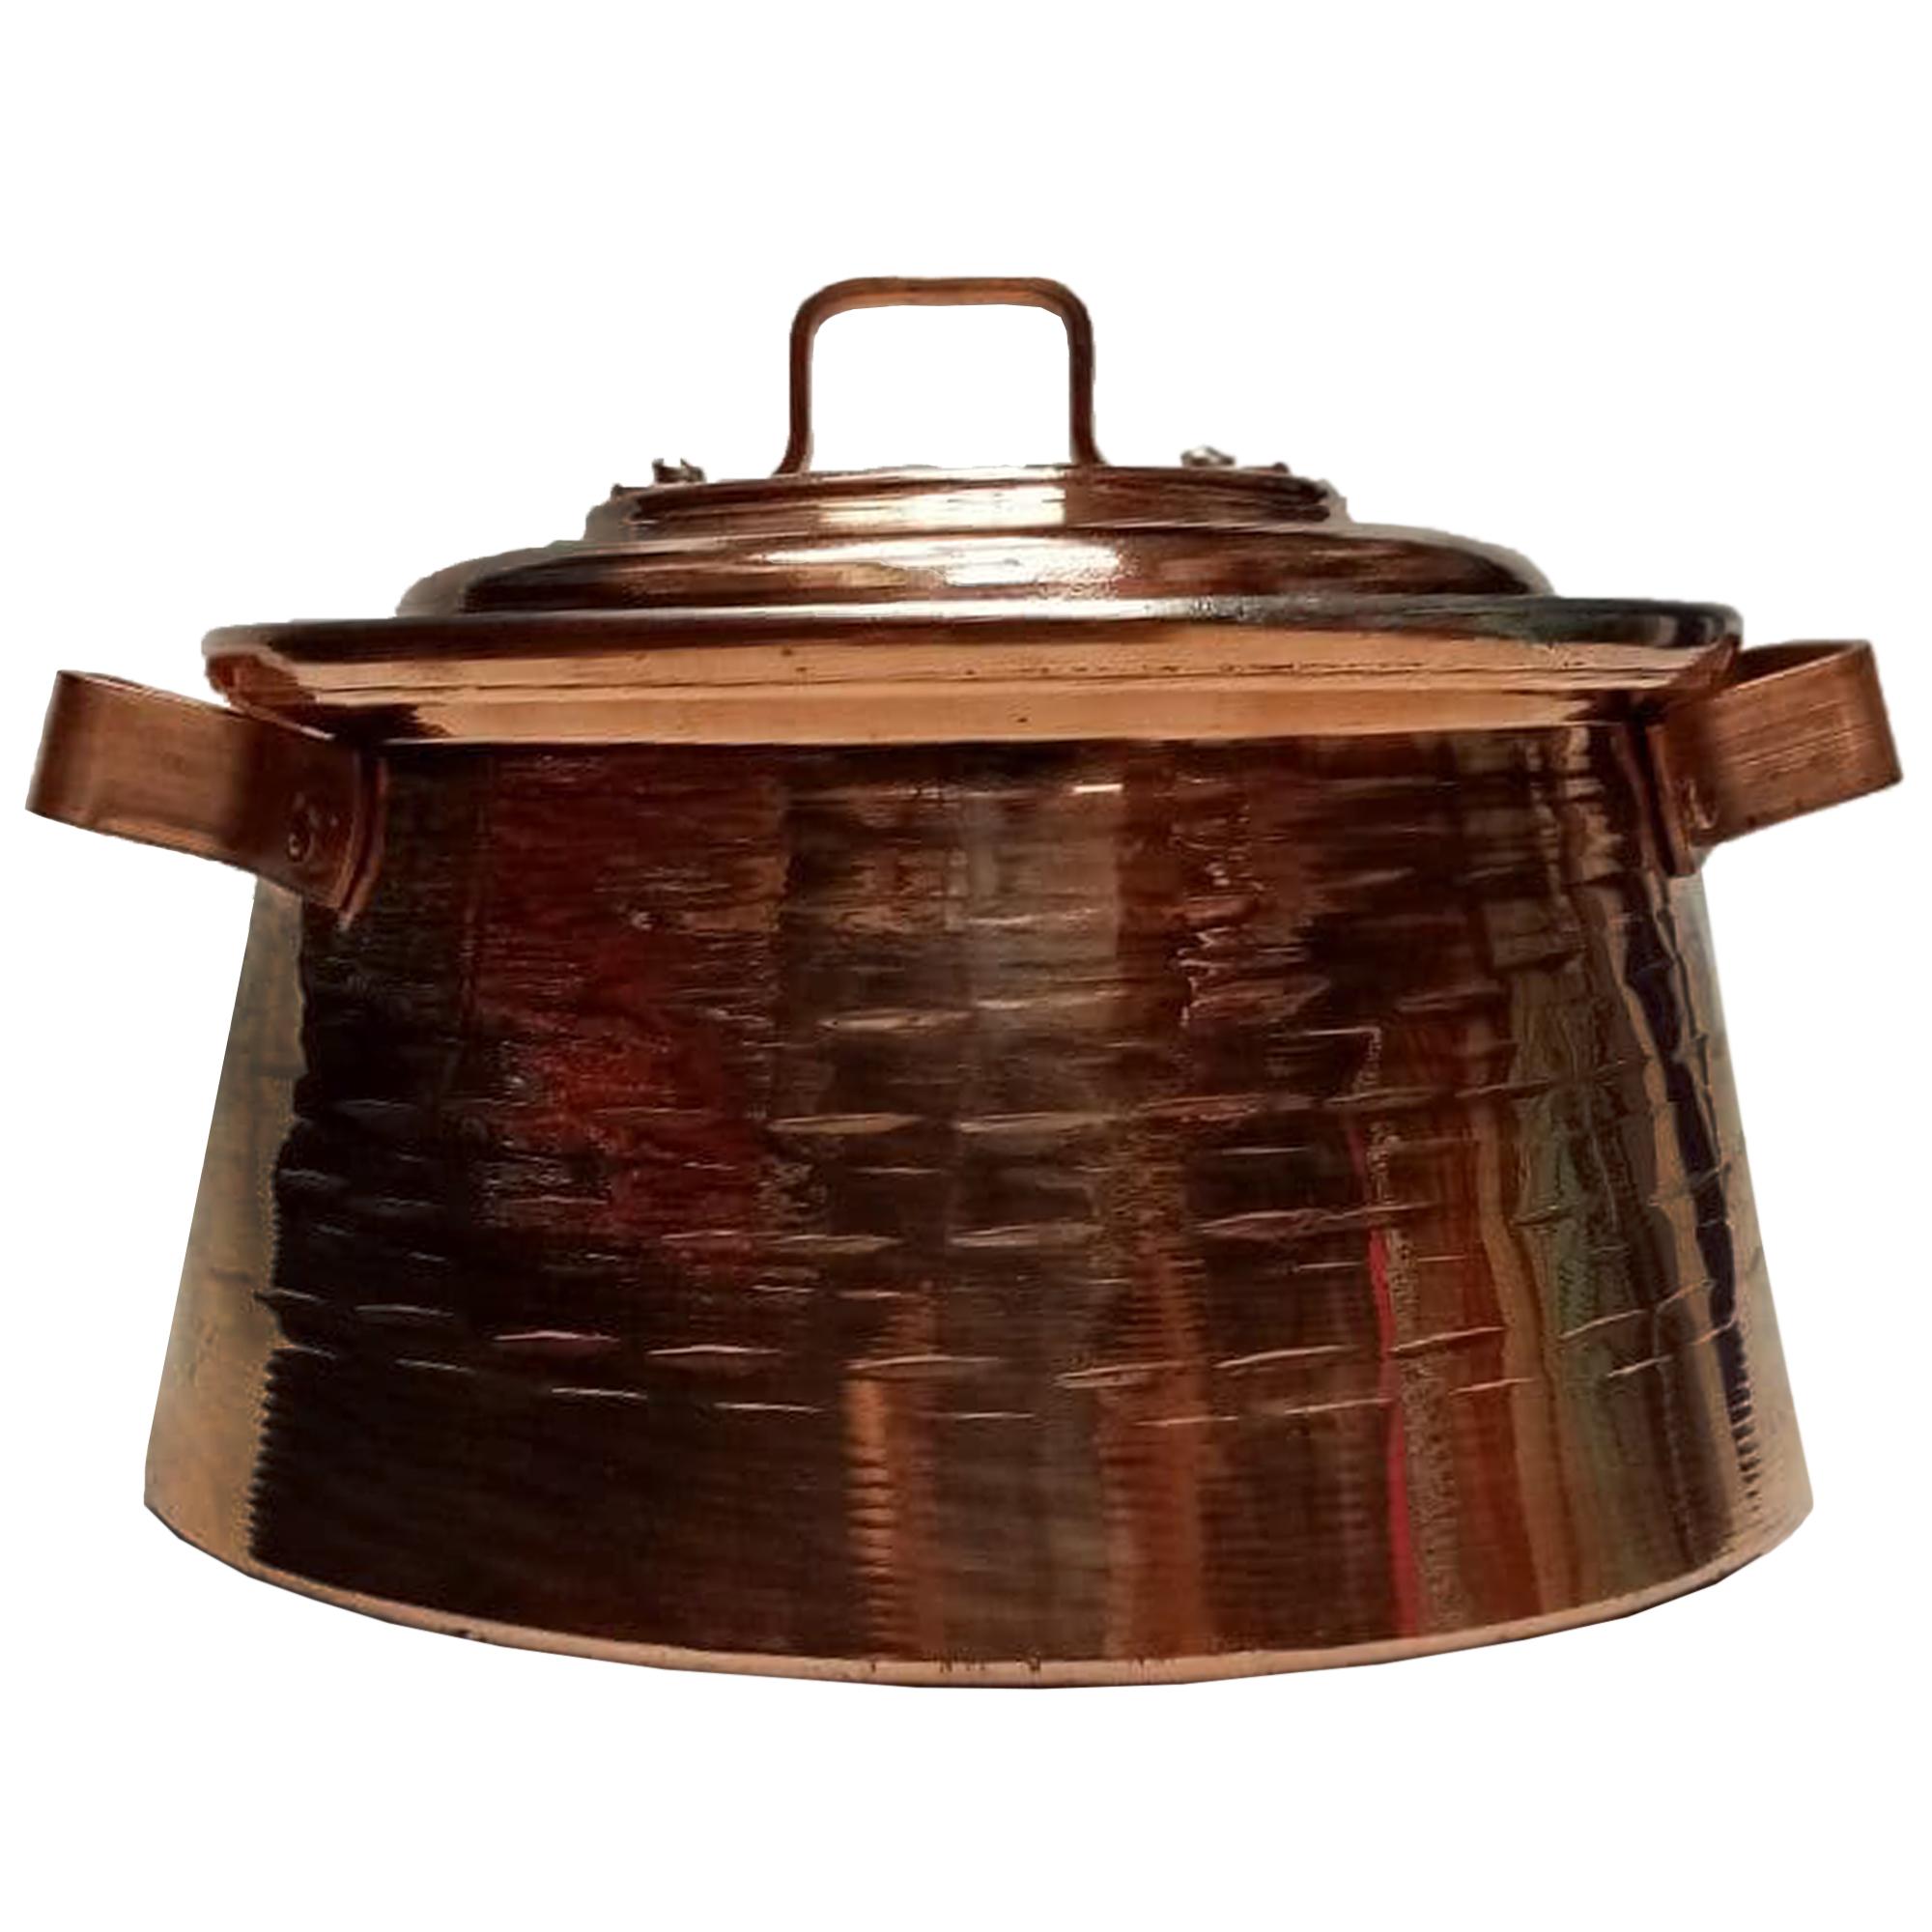 Copper pan, Model M25